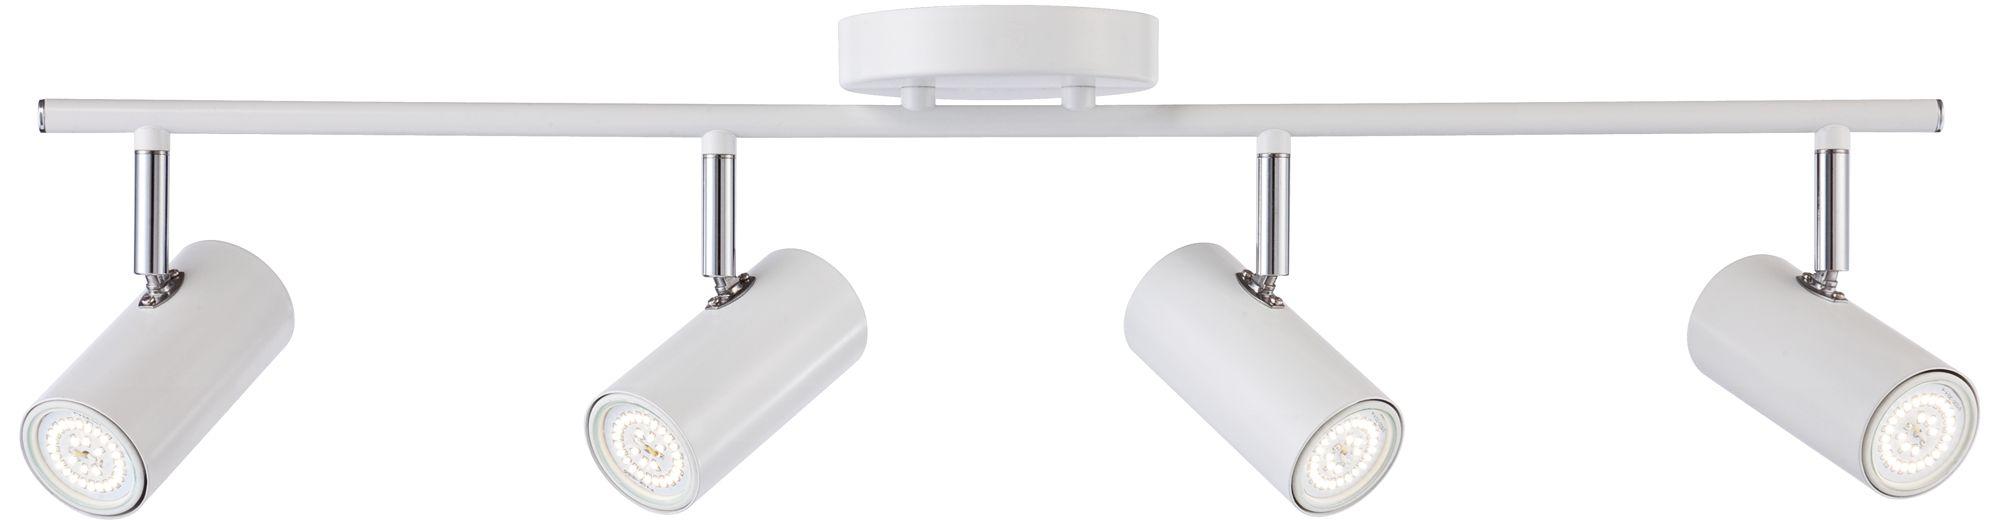 galena 4light matte white led track fixture